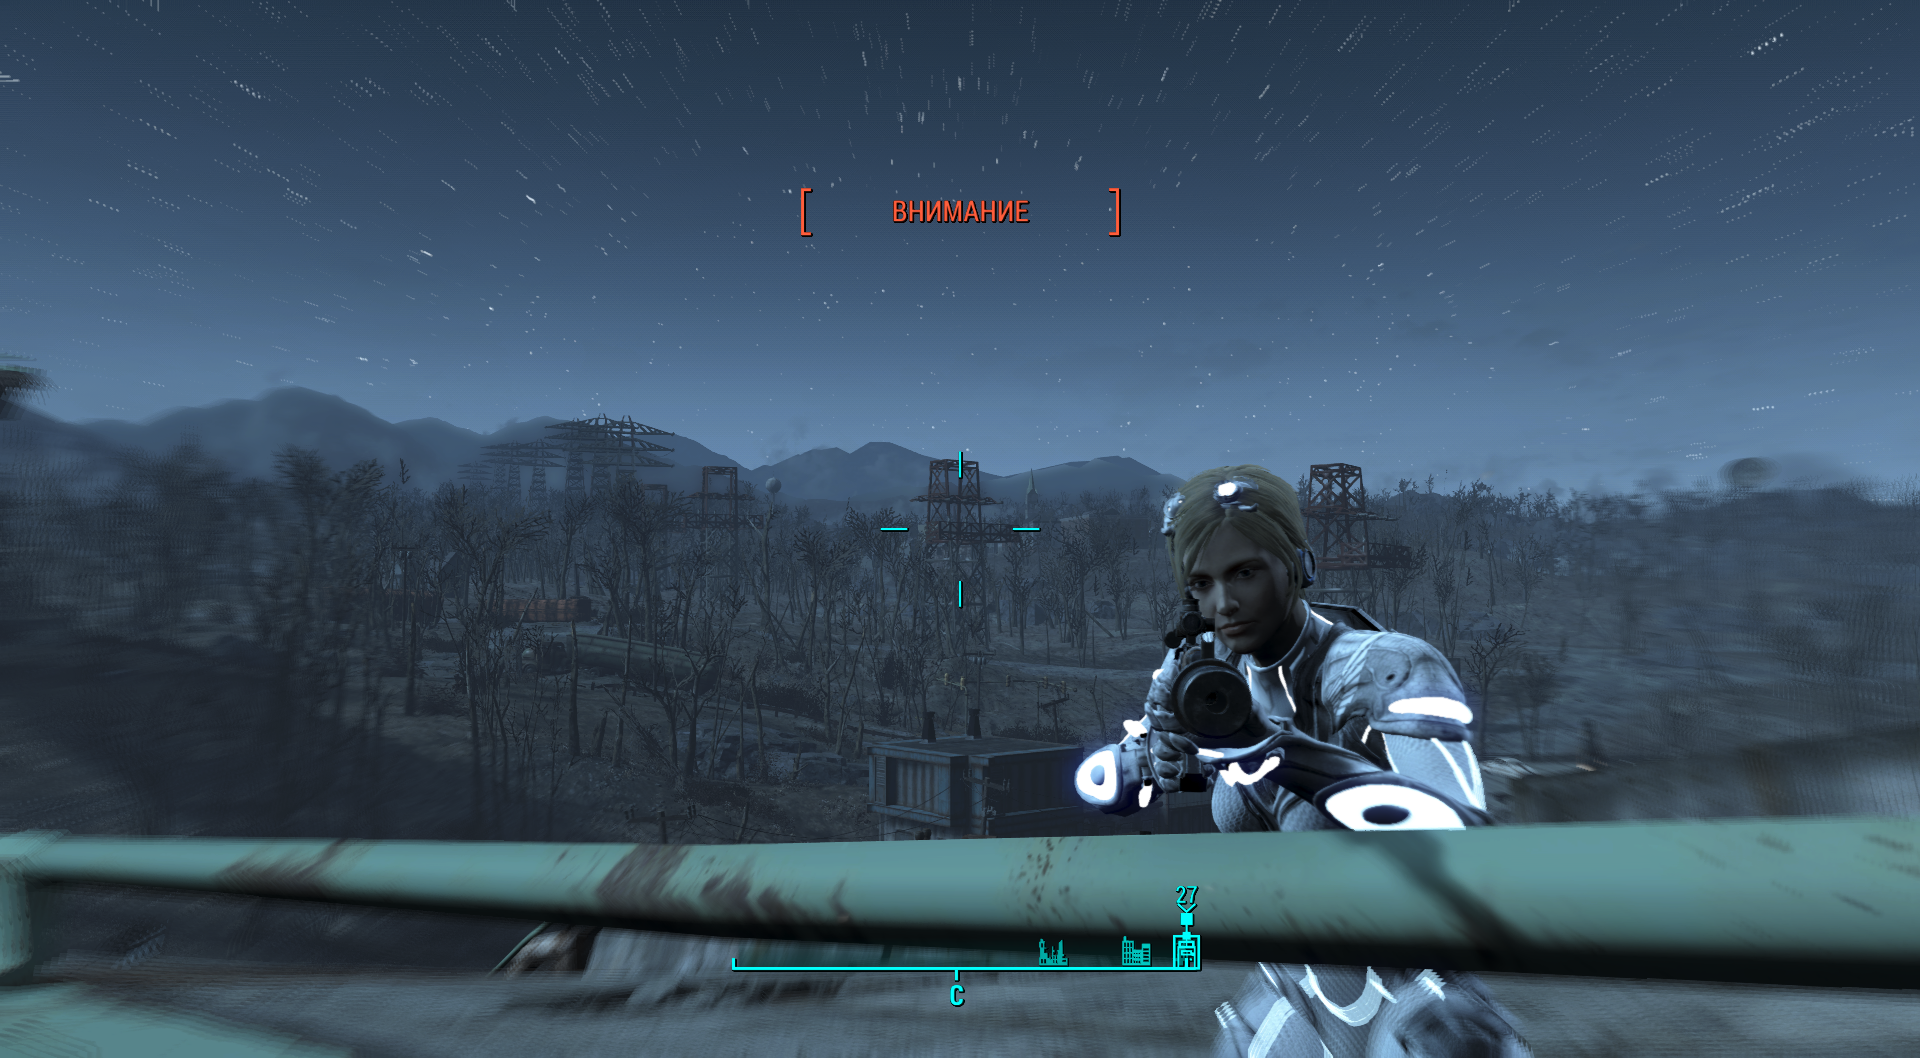 Нова (starcraft 2) - Fallout 4